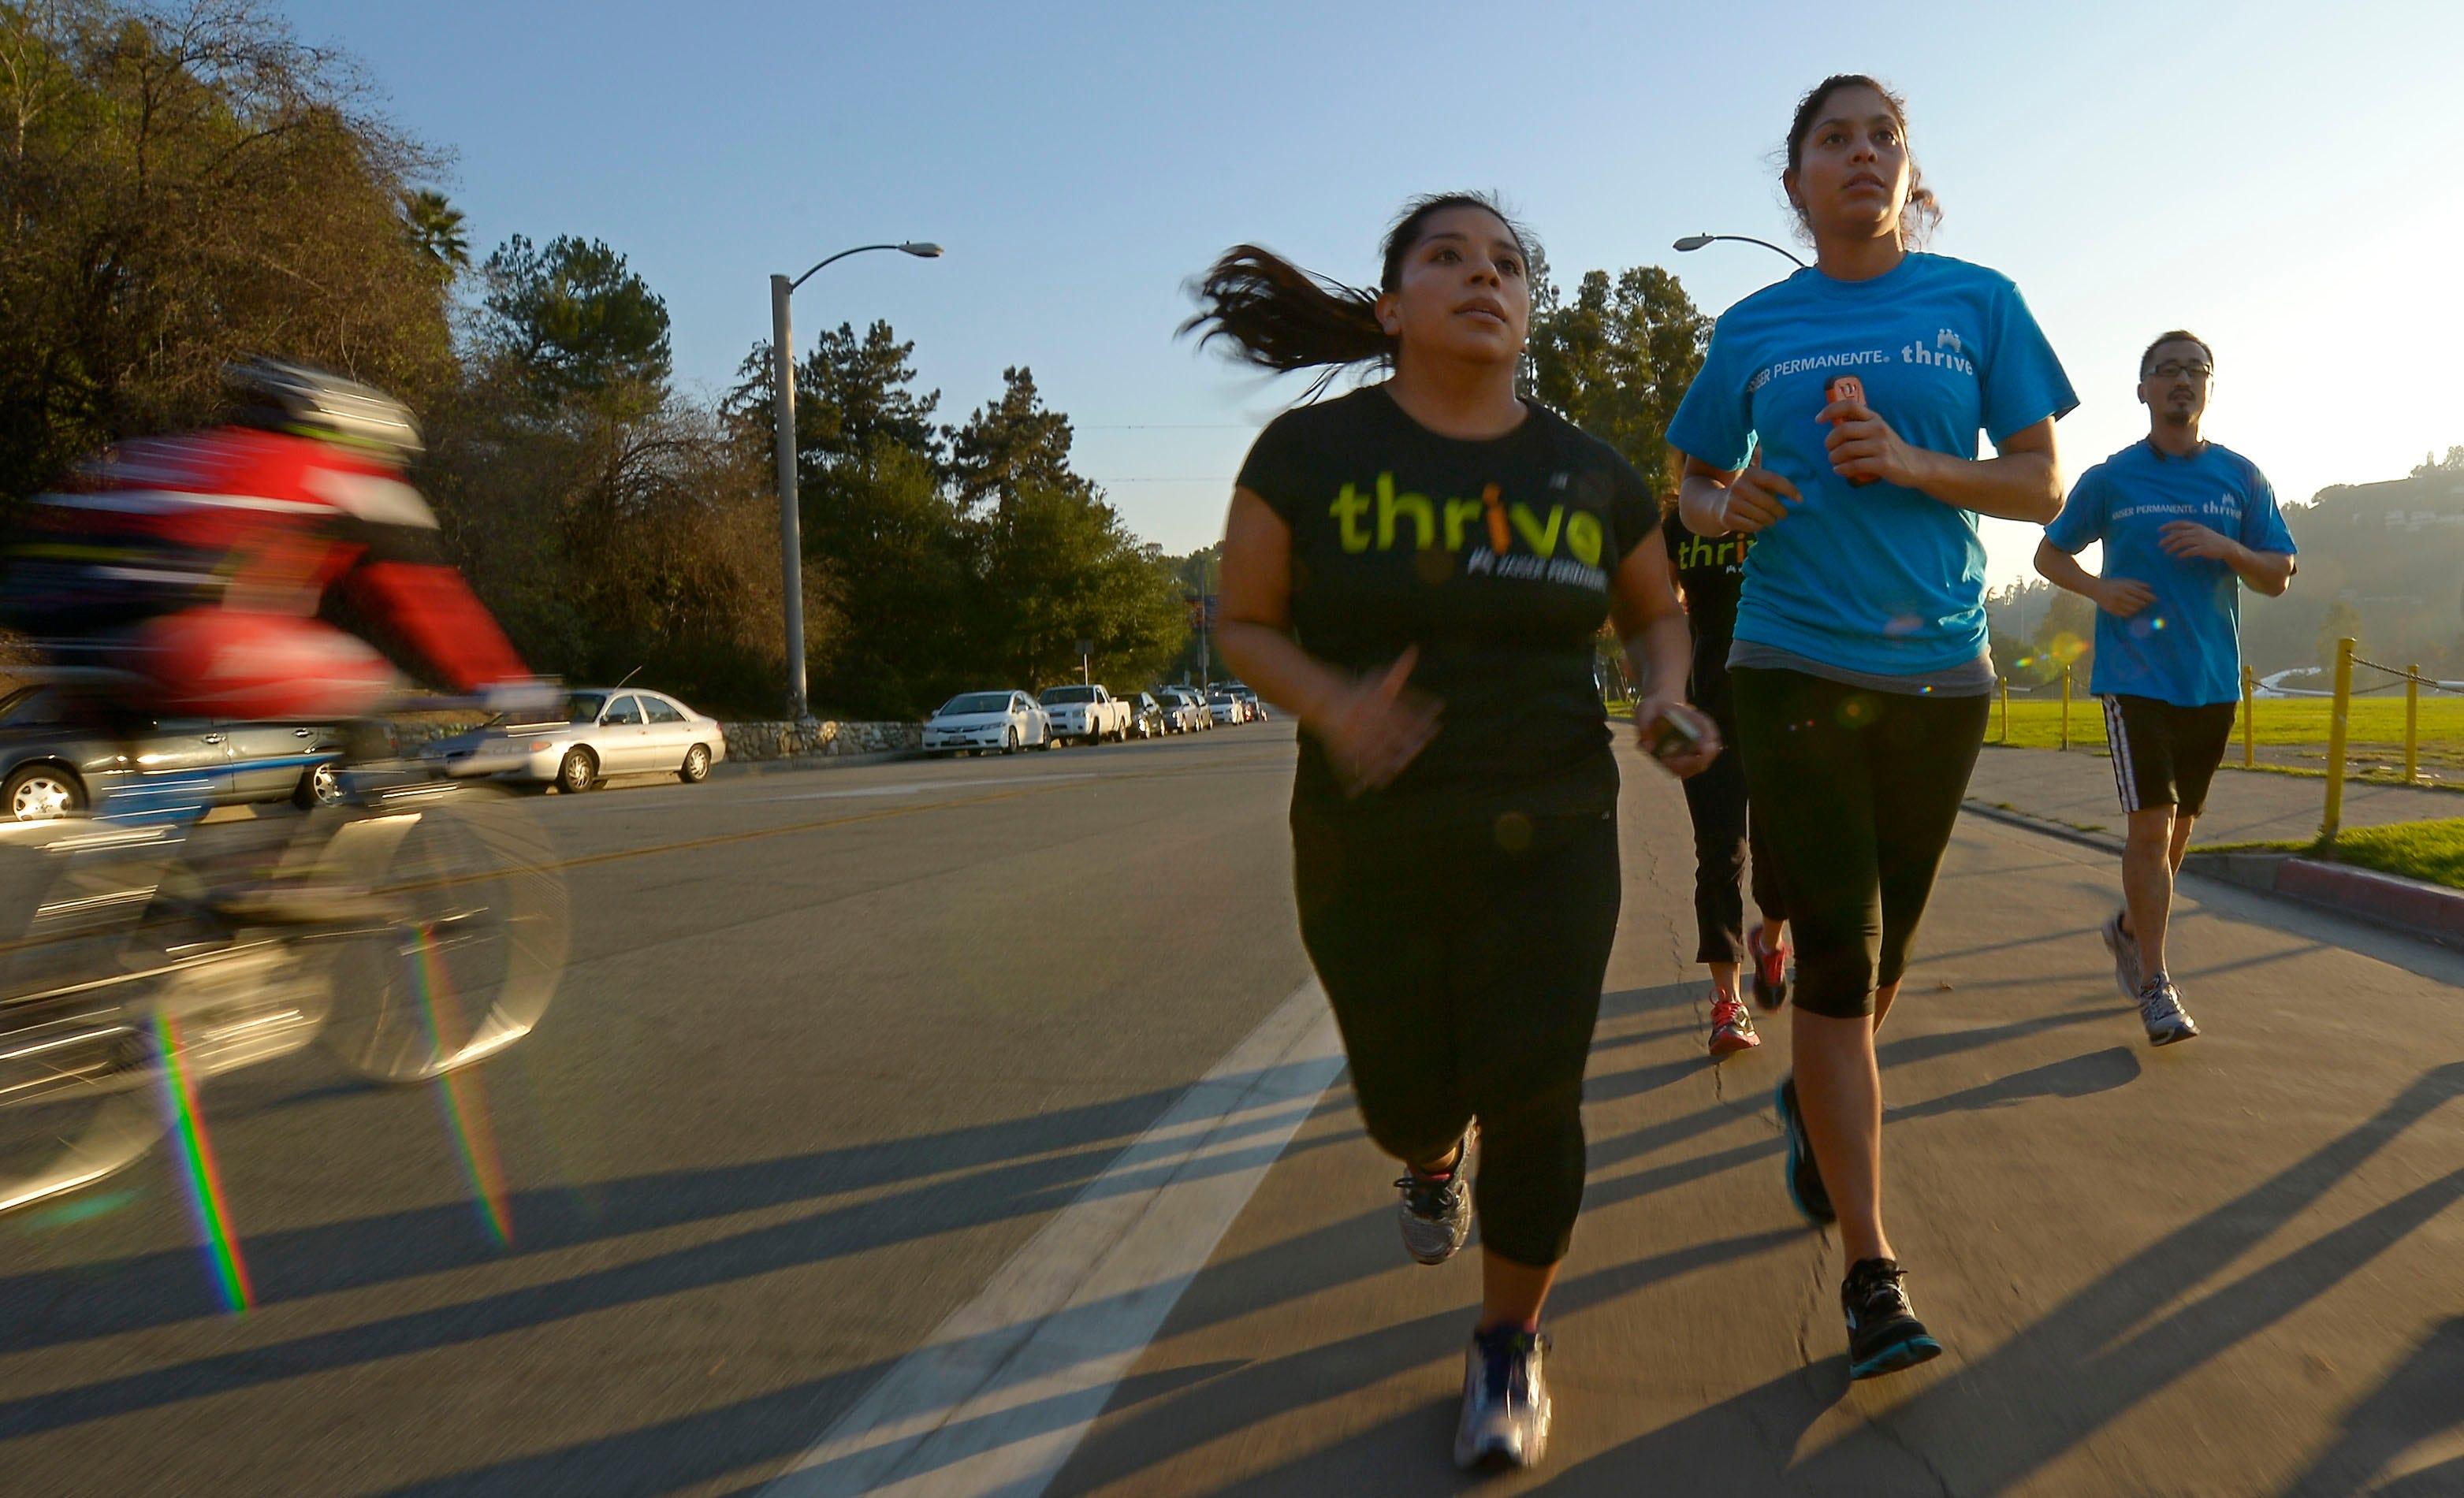 Shock! Running may actually make knees healthier